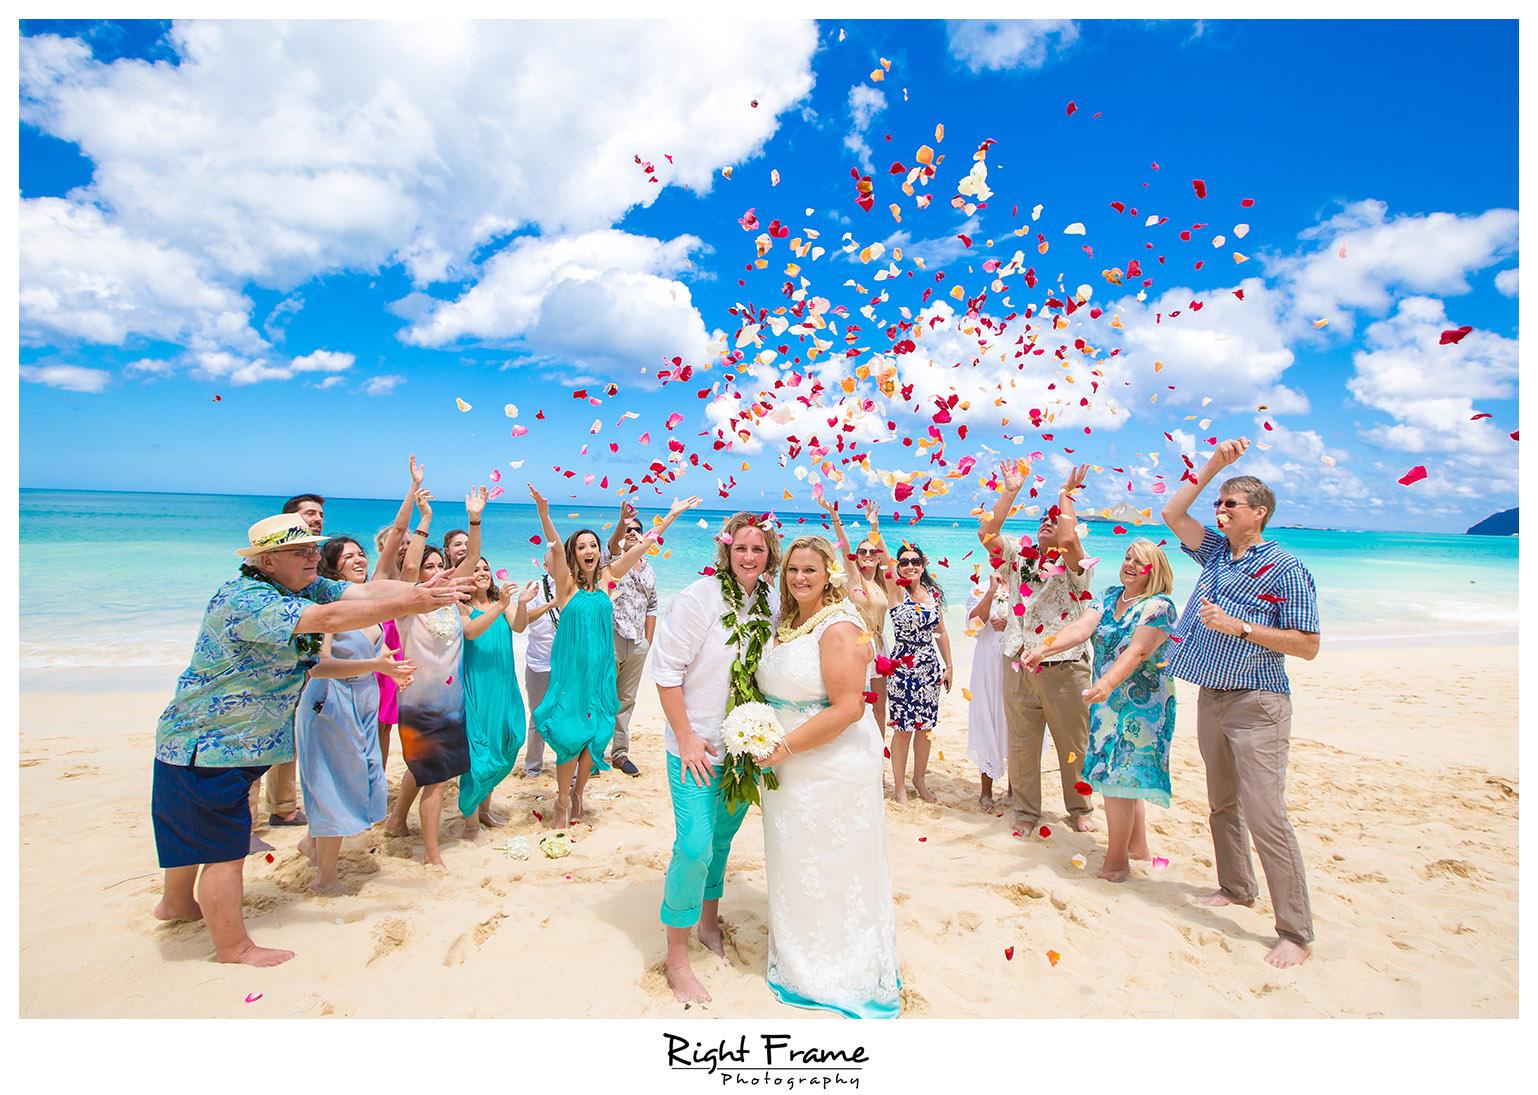 Hawaii Beach Wedding At Hale Pohaku Waimo By Right Frame